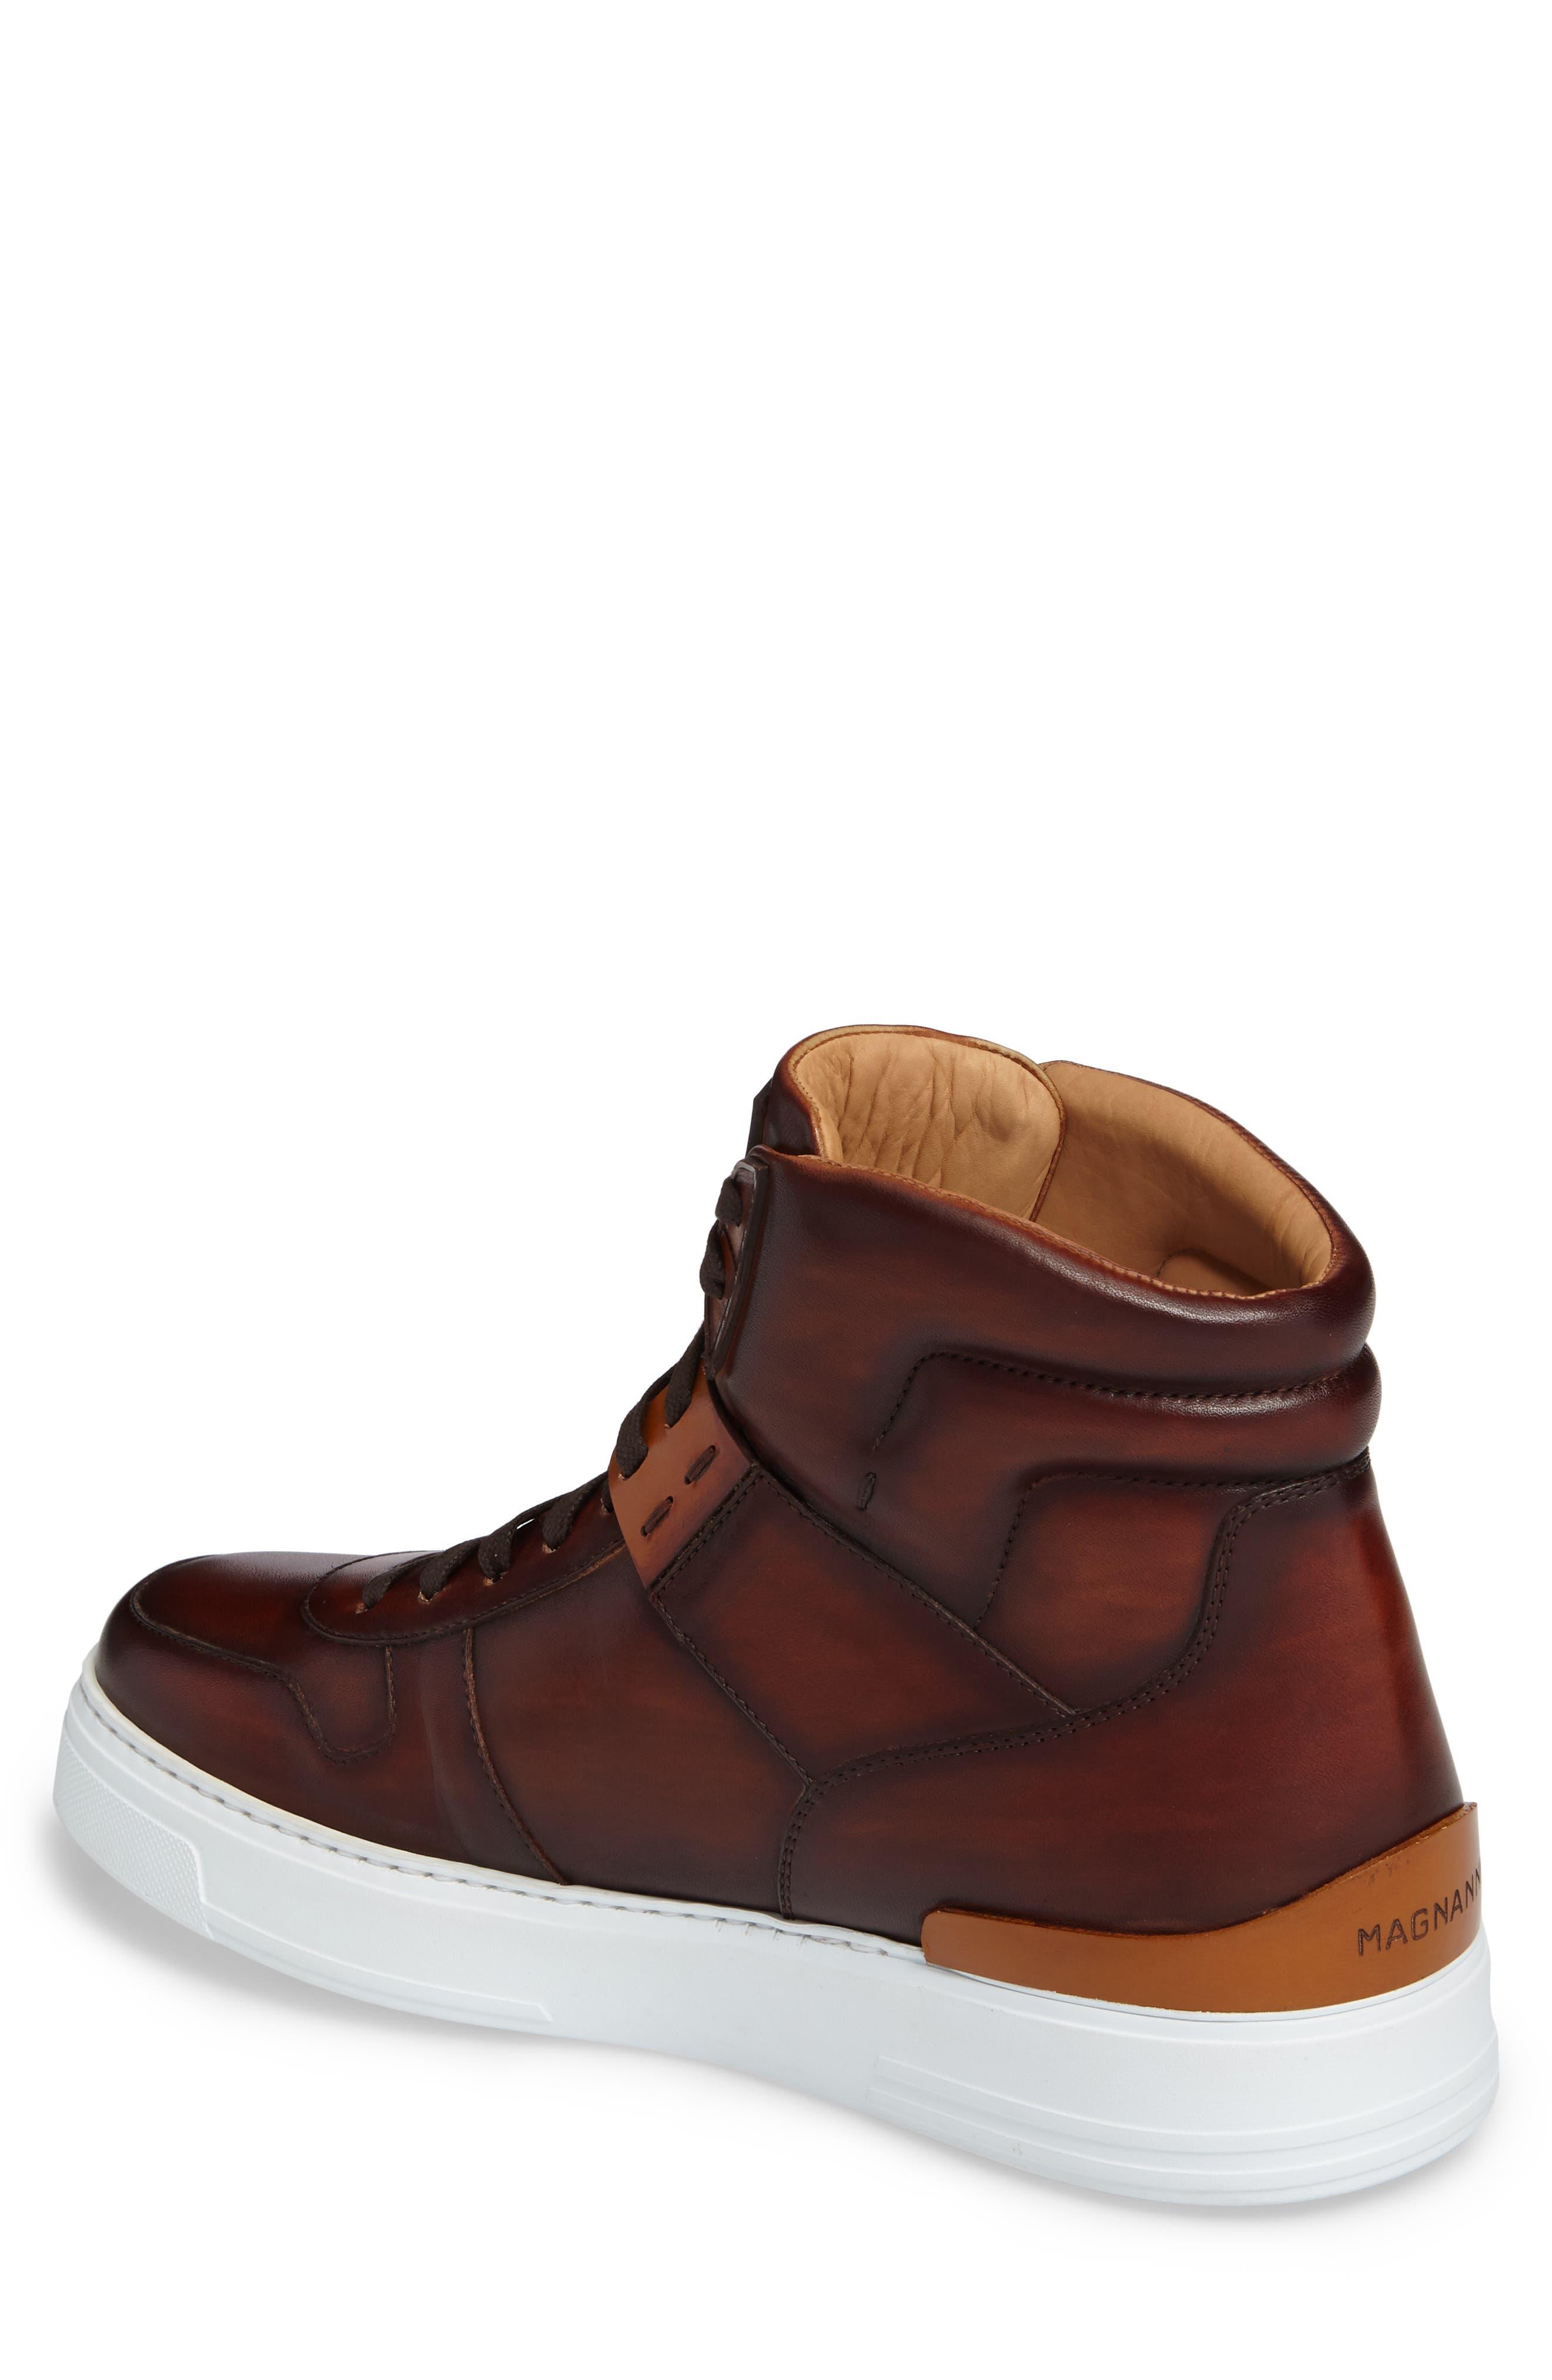 Endo Hi Sneaker,                             Alternate thumbnail 2, color,                             230